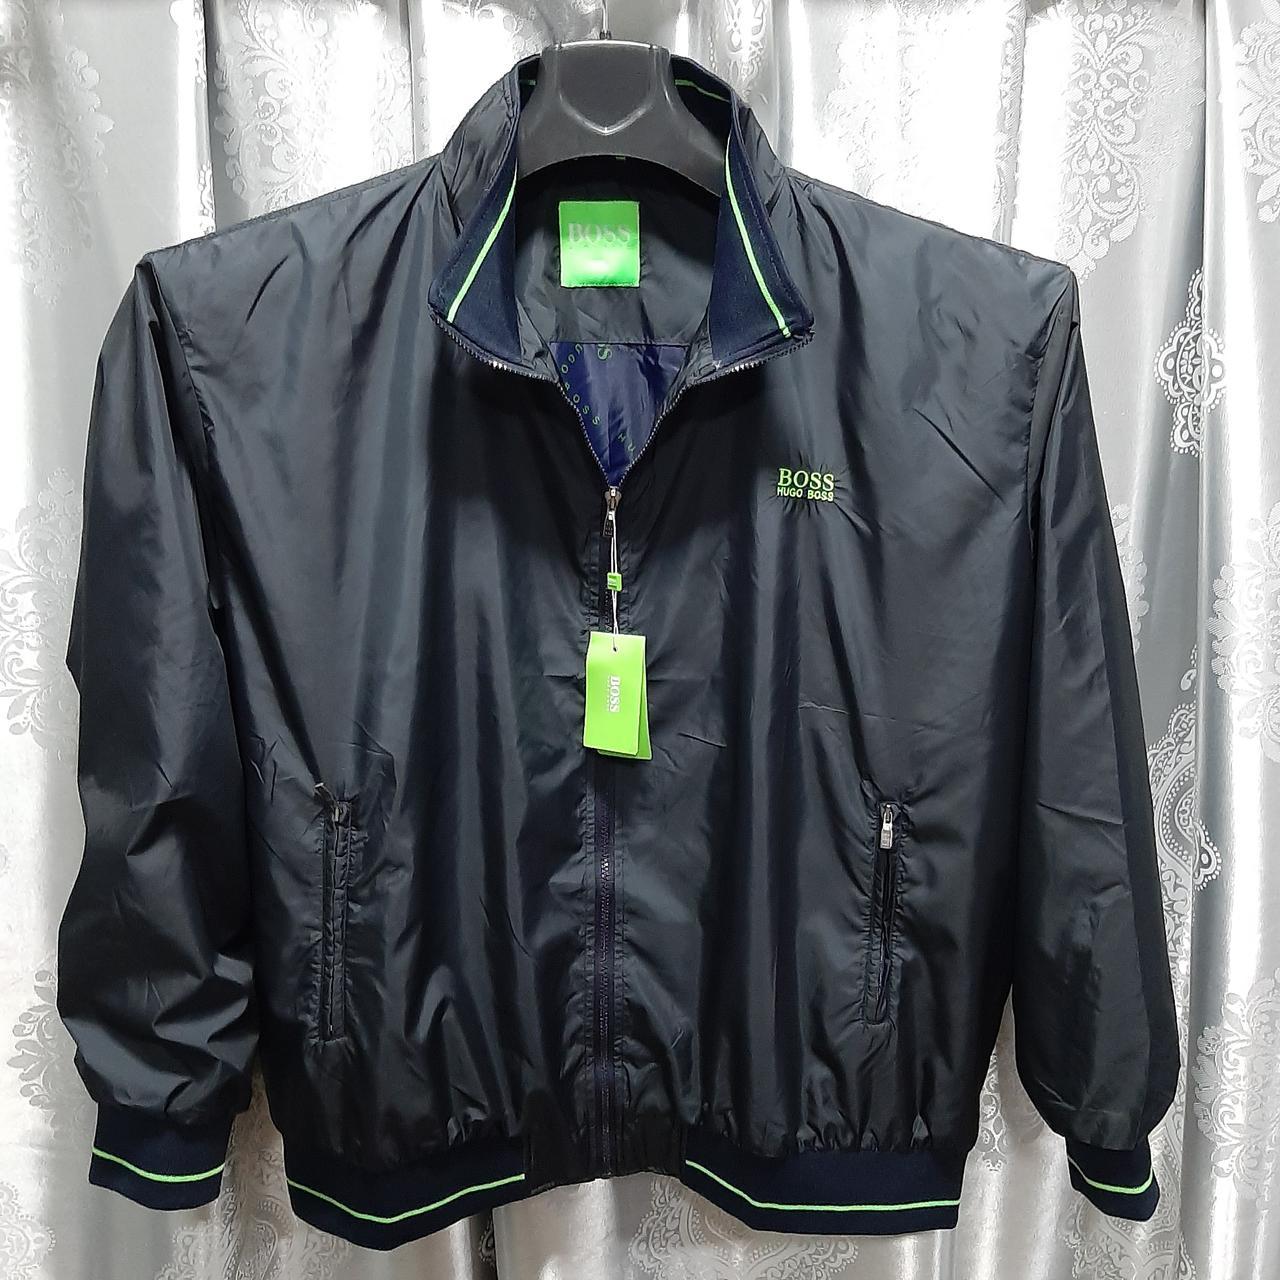 Куртка Hugo Boss / 5 - 7 XL / Турция